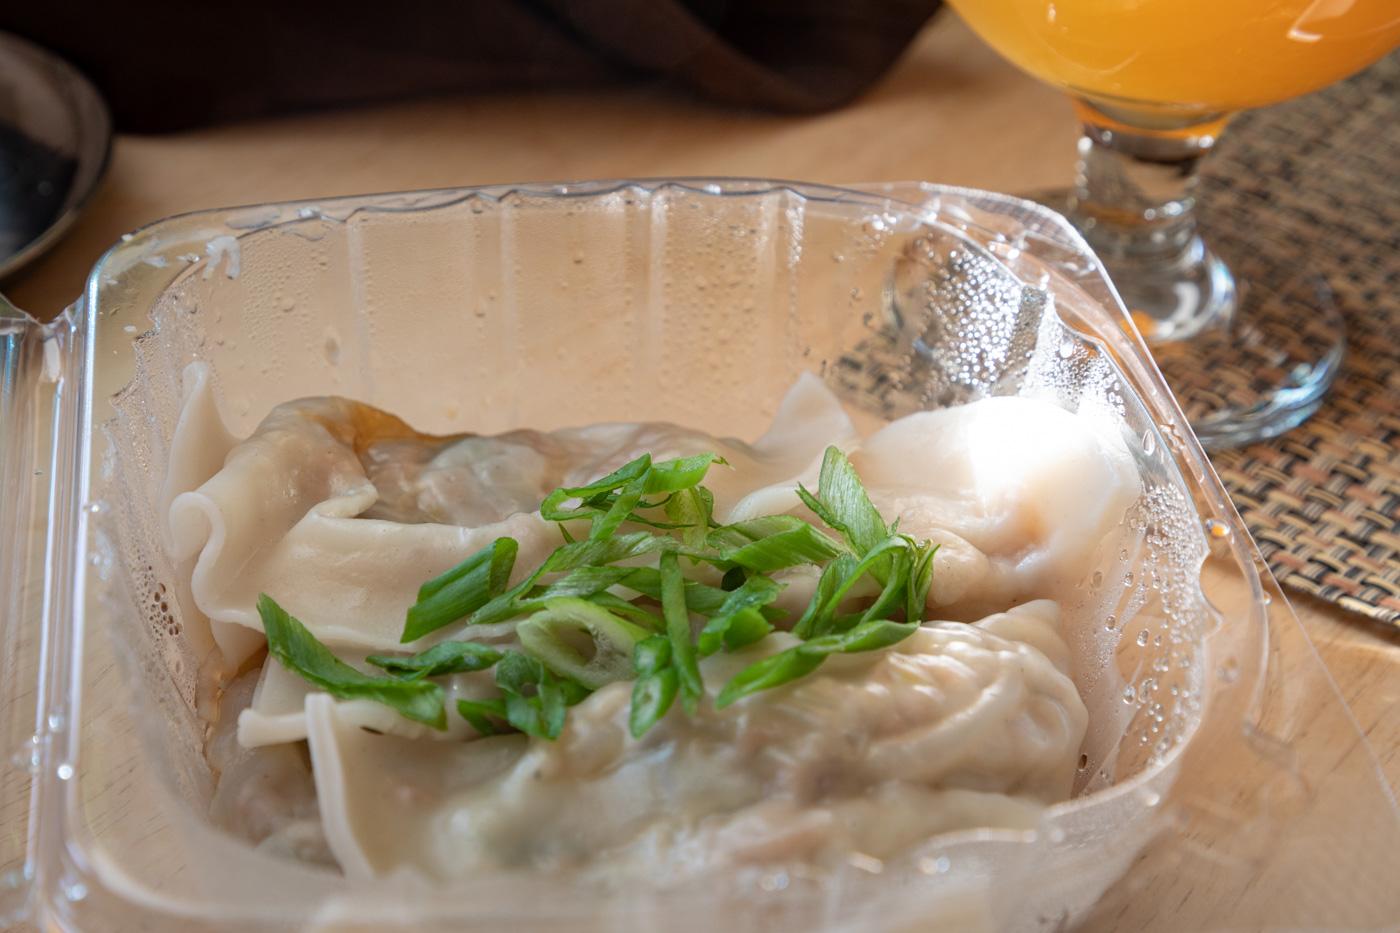 Steamed Vegetable Dumplings from SouthGate